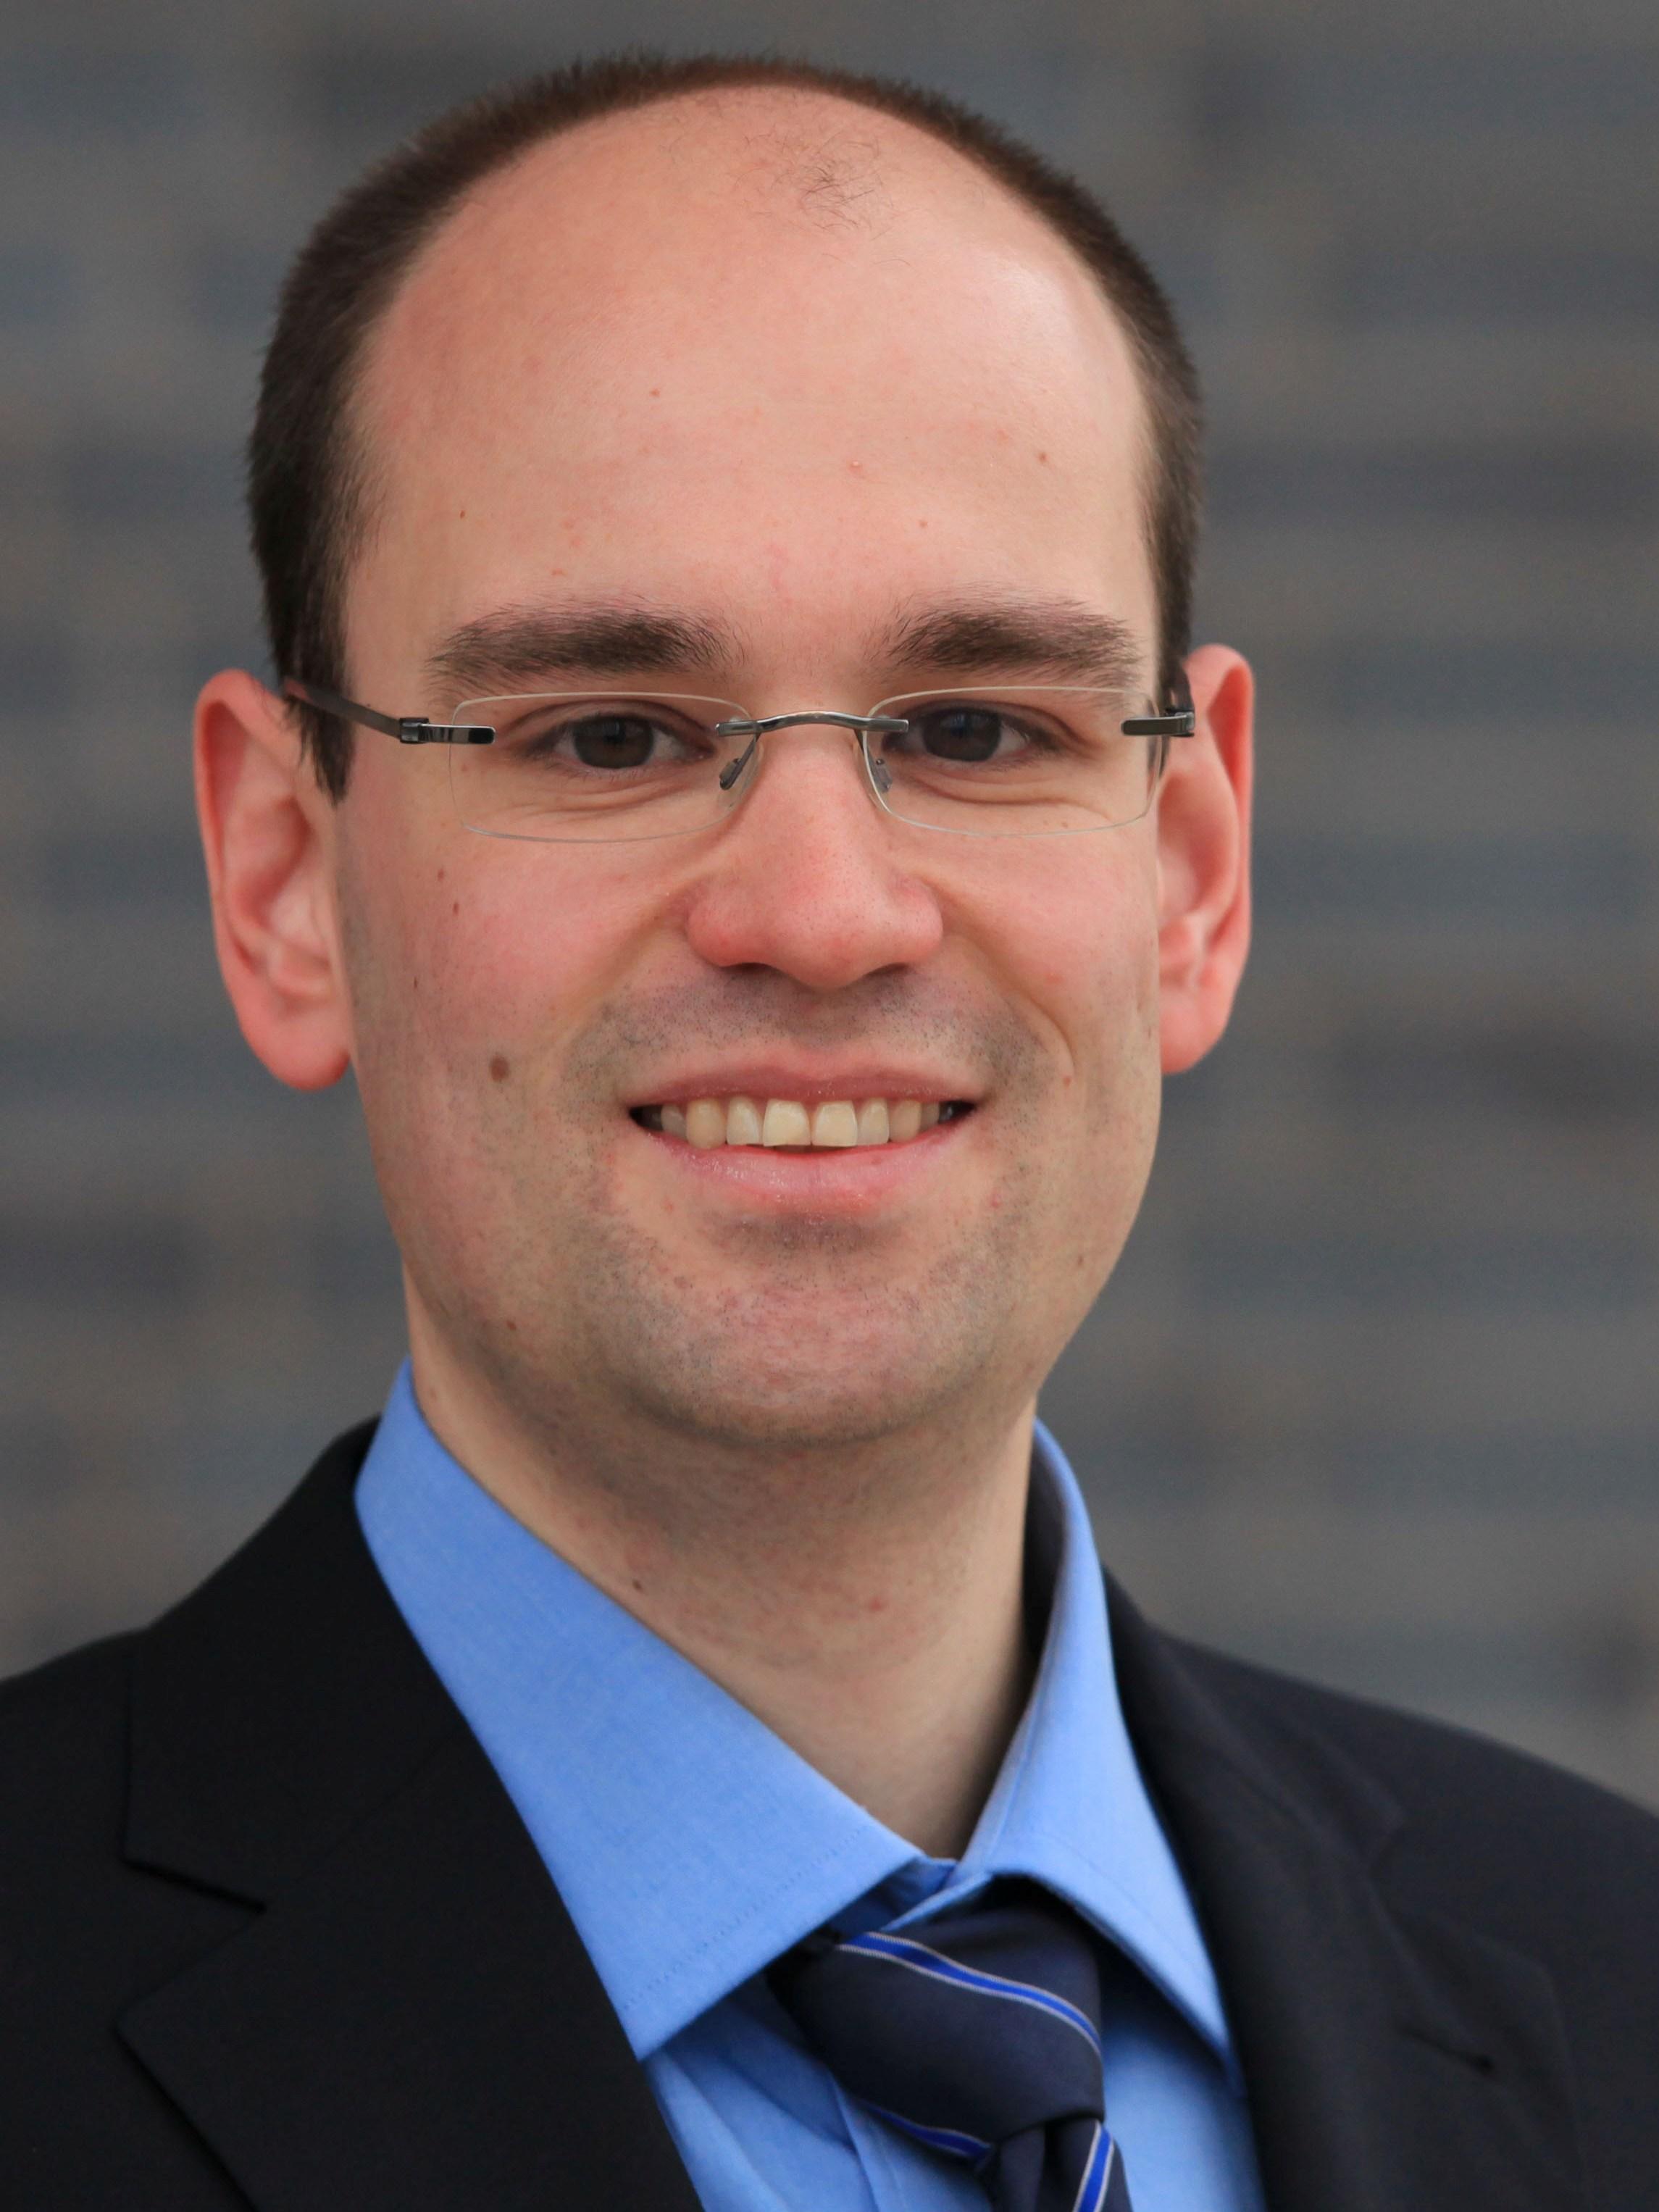 Daniel Mark